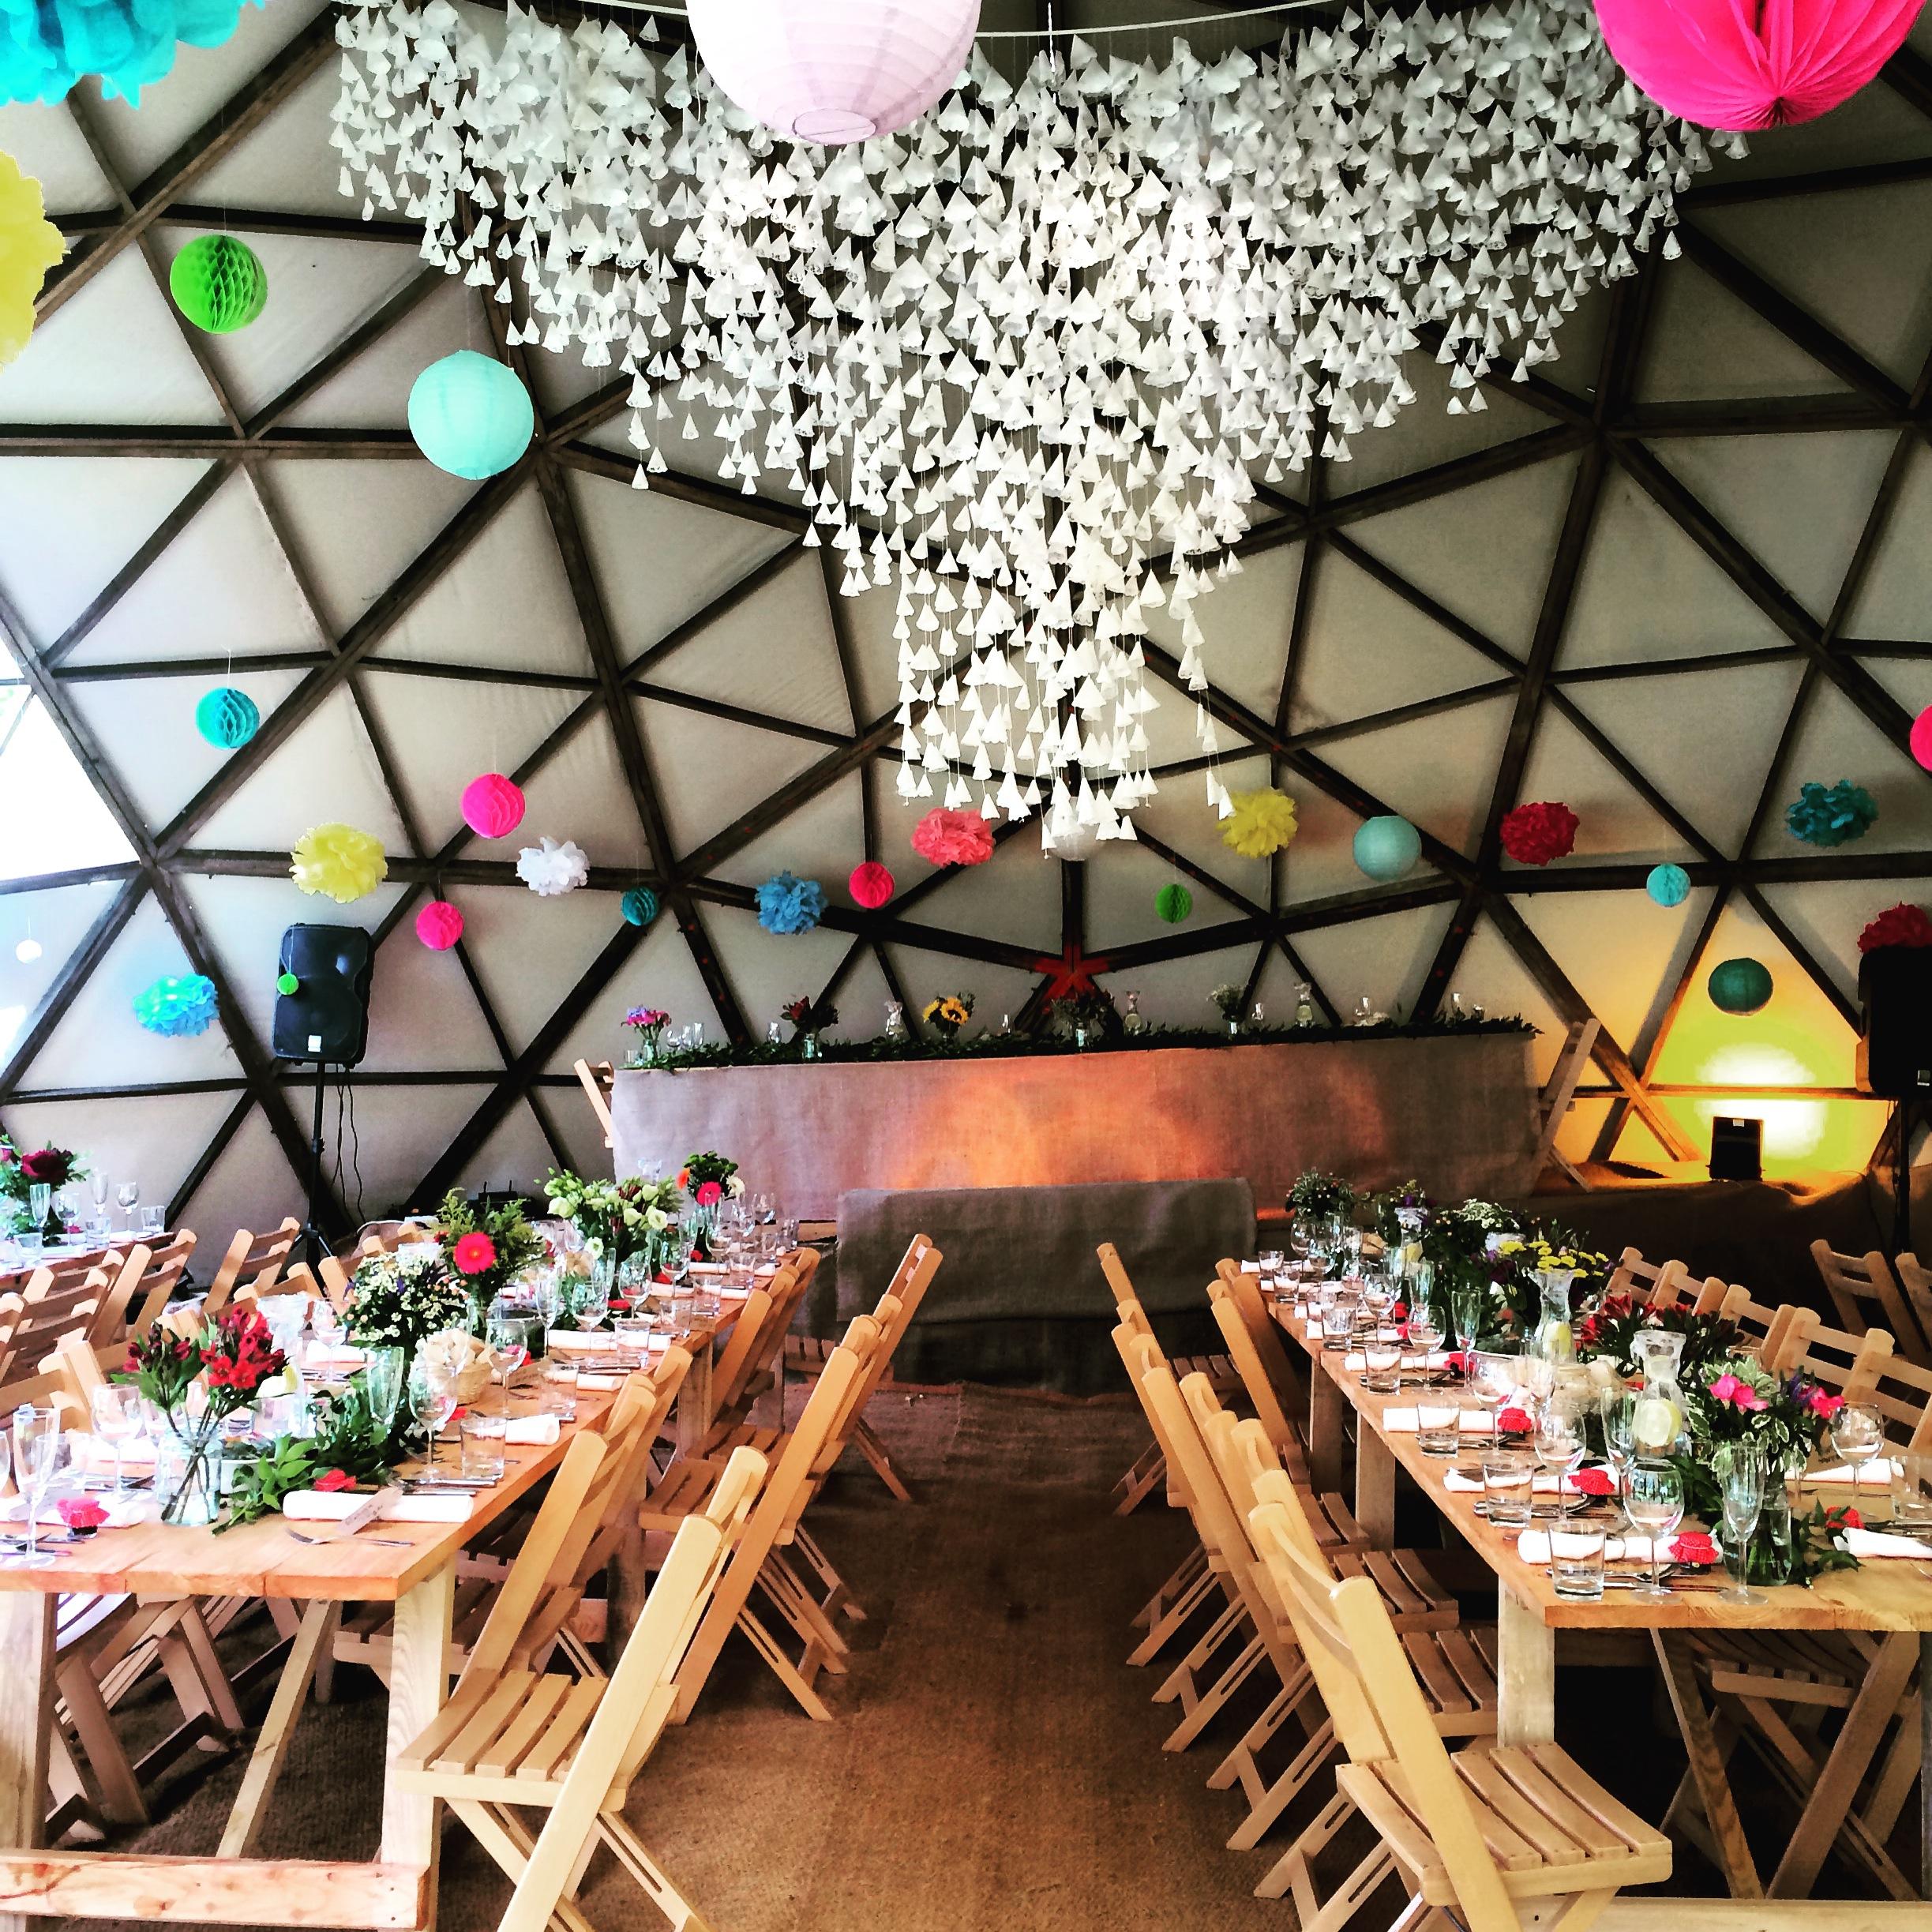 Rustic festival wedding venue north devon tents events photo 3 junglespirit Image collections